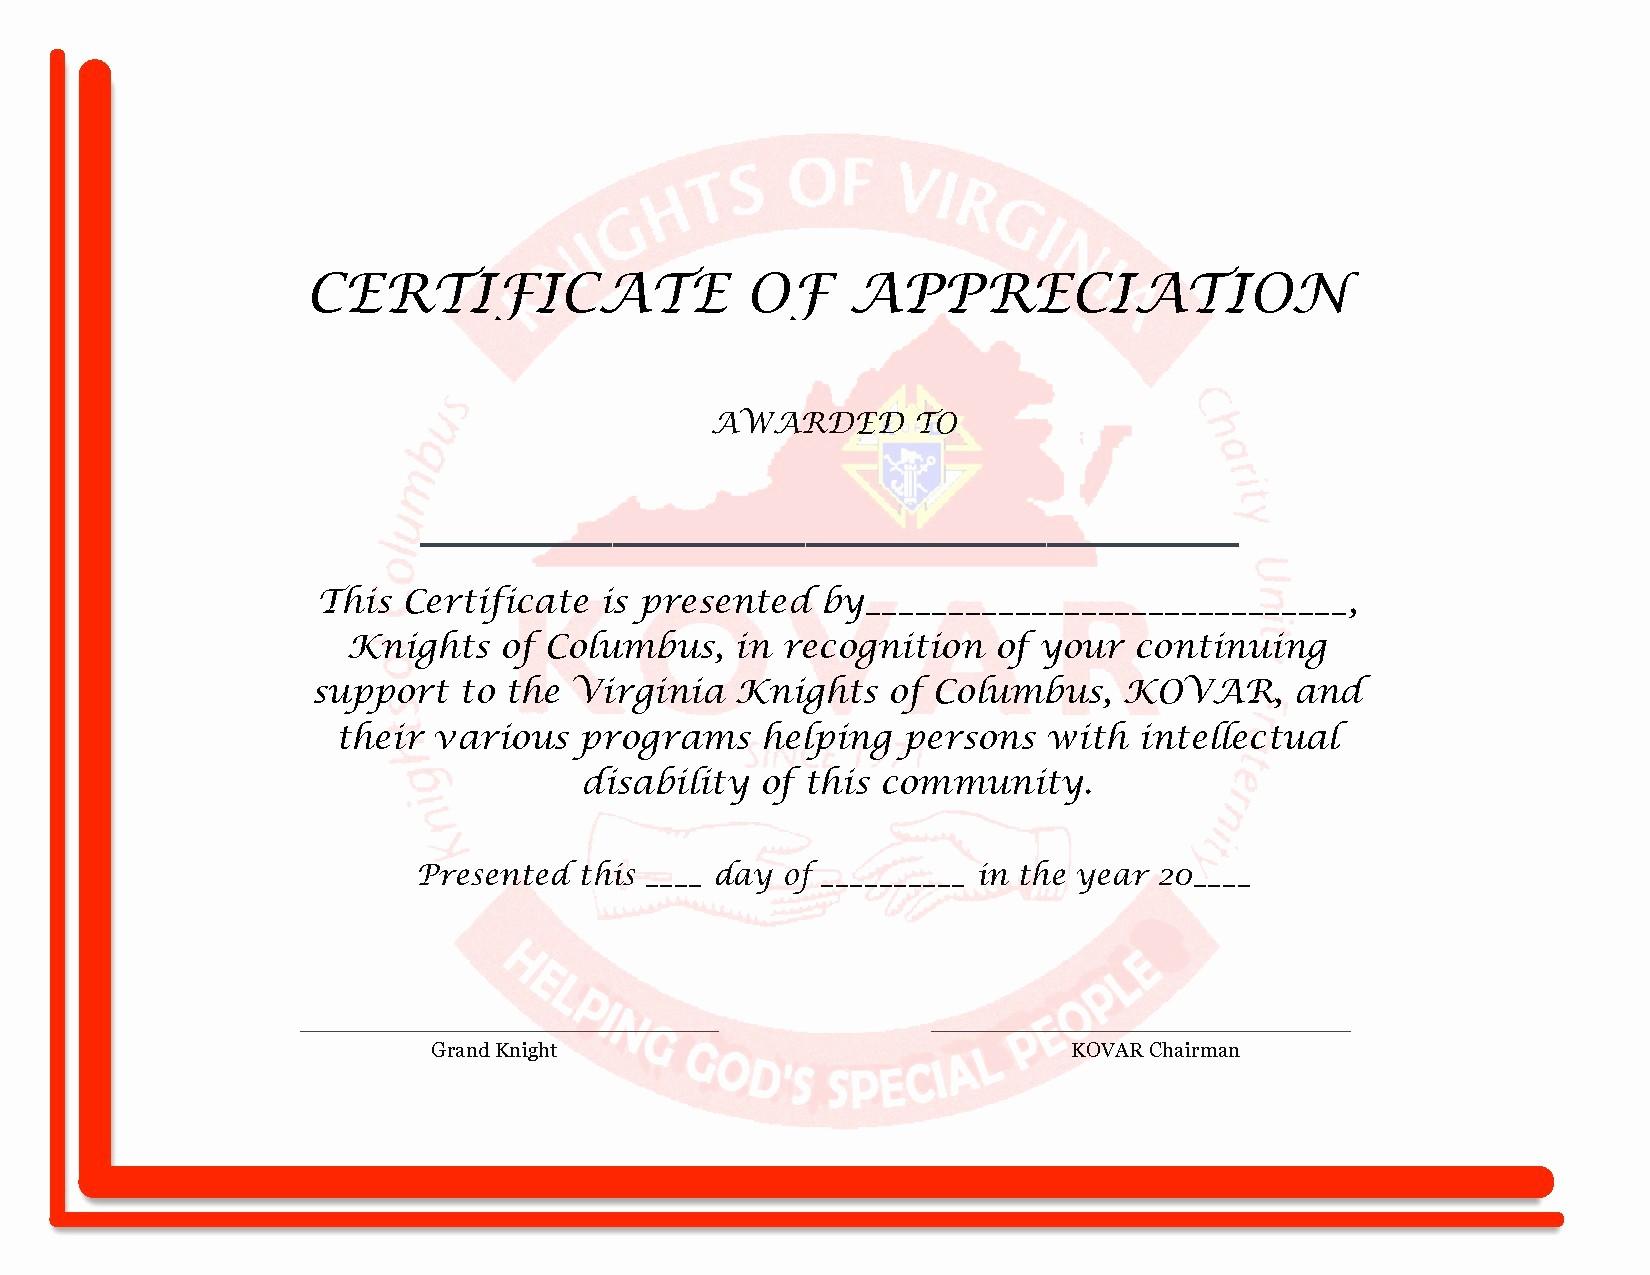 Employee Recognition Certificates Templates Free New Appreciation Certificatee for Employee Employees Es Esls